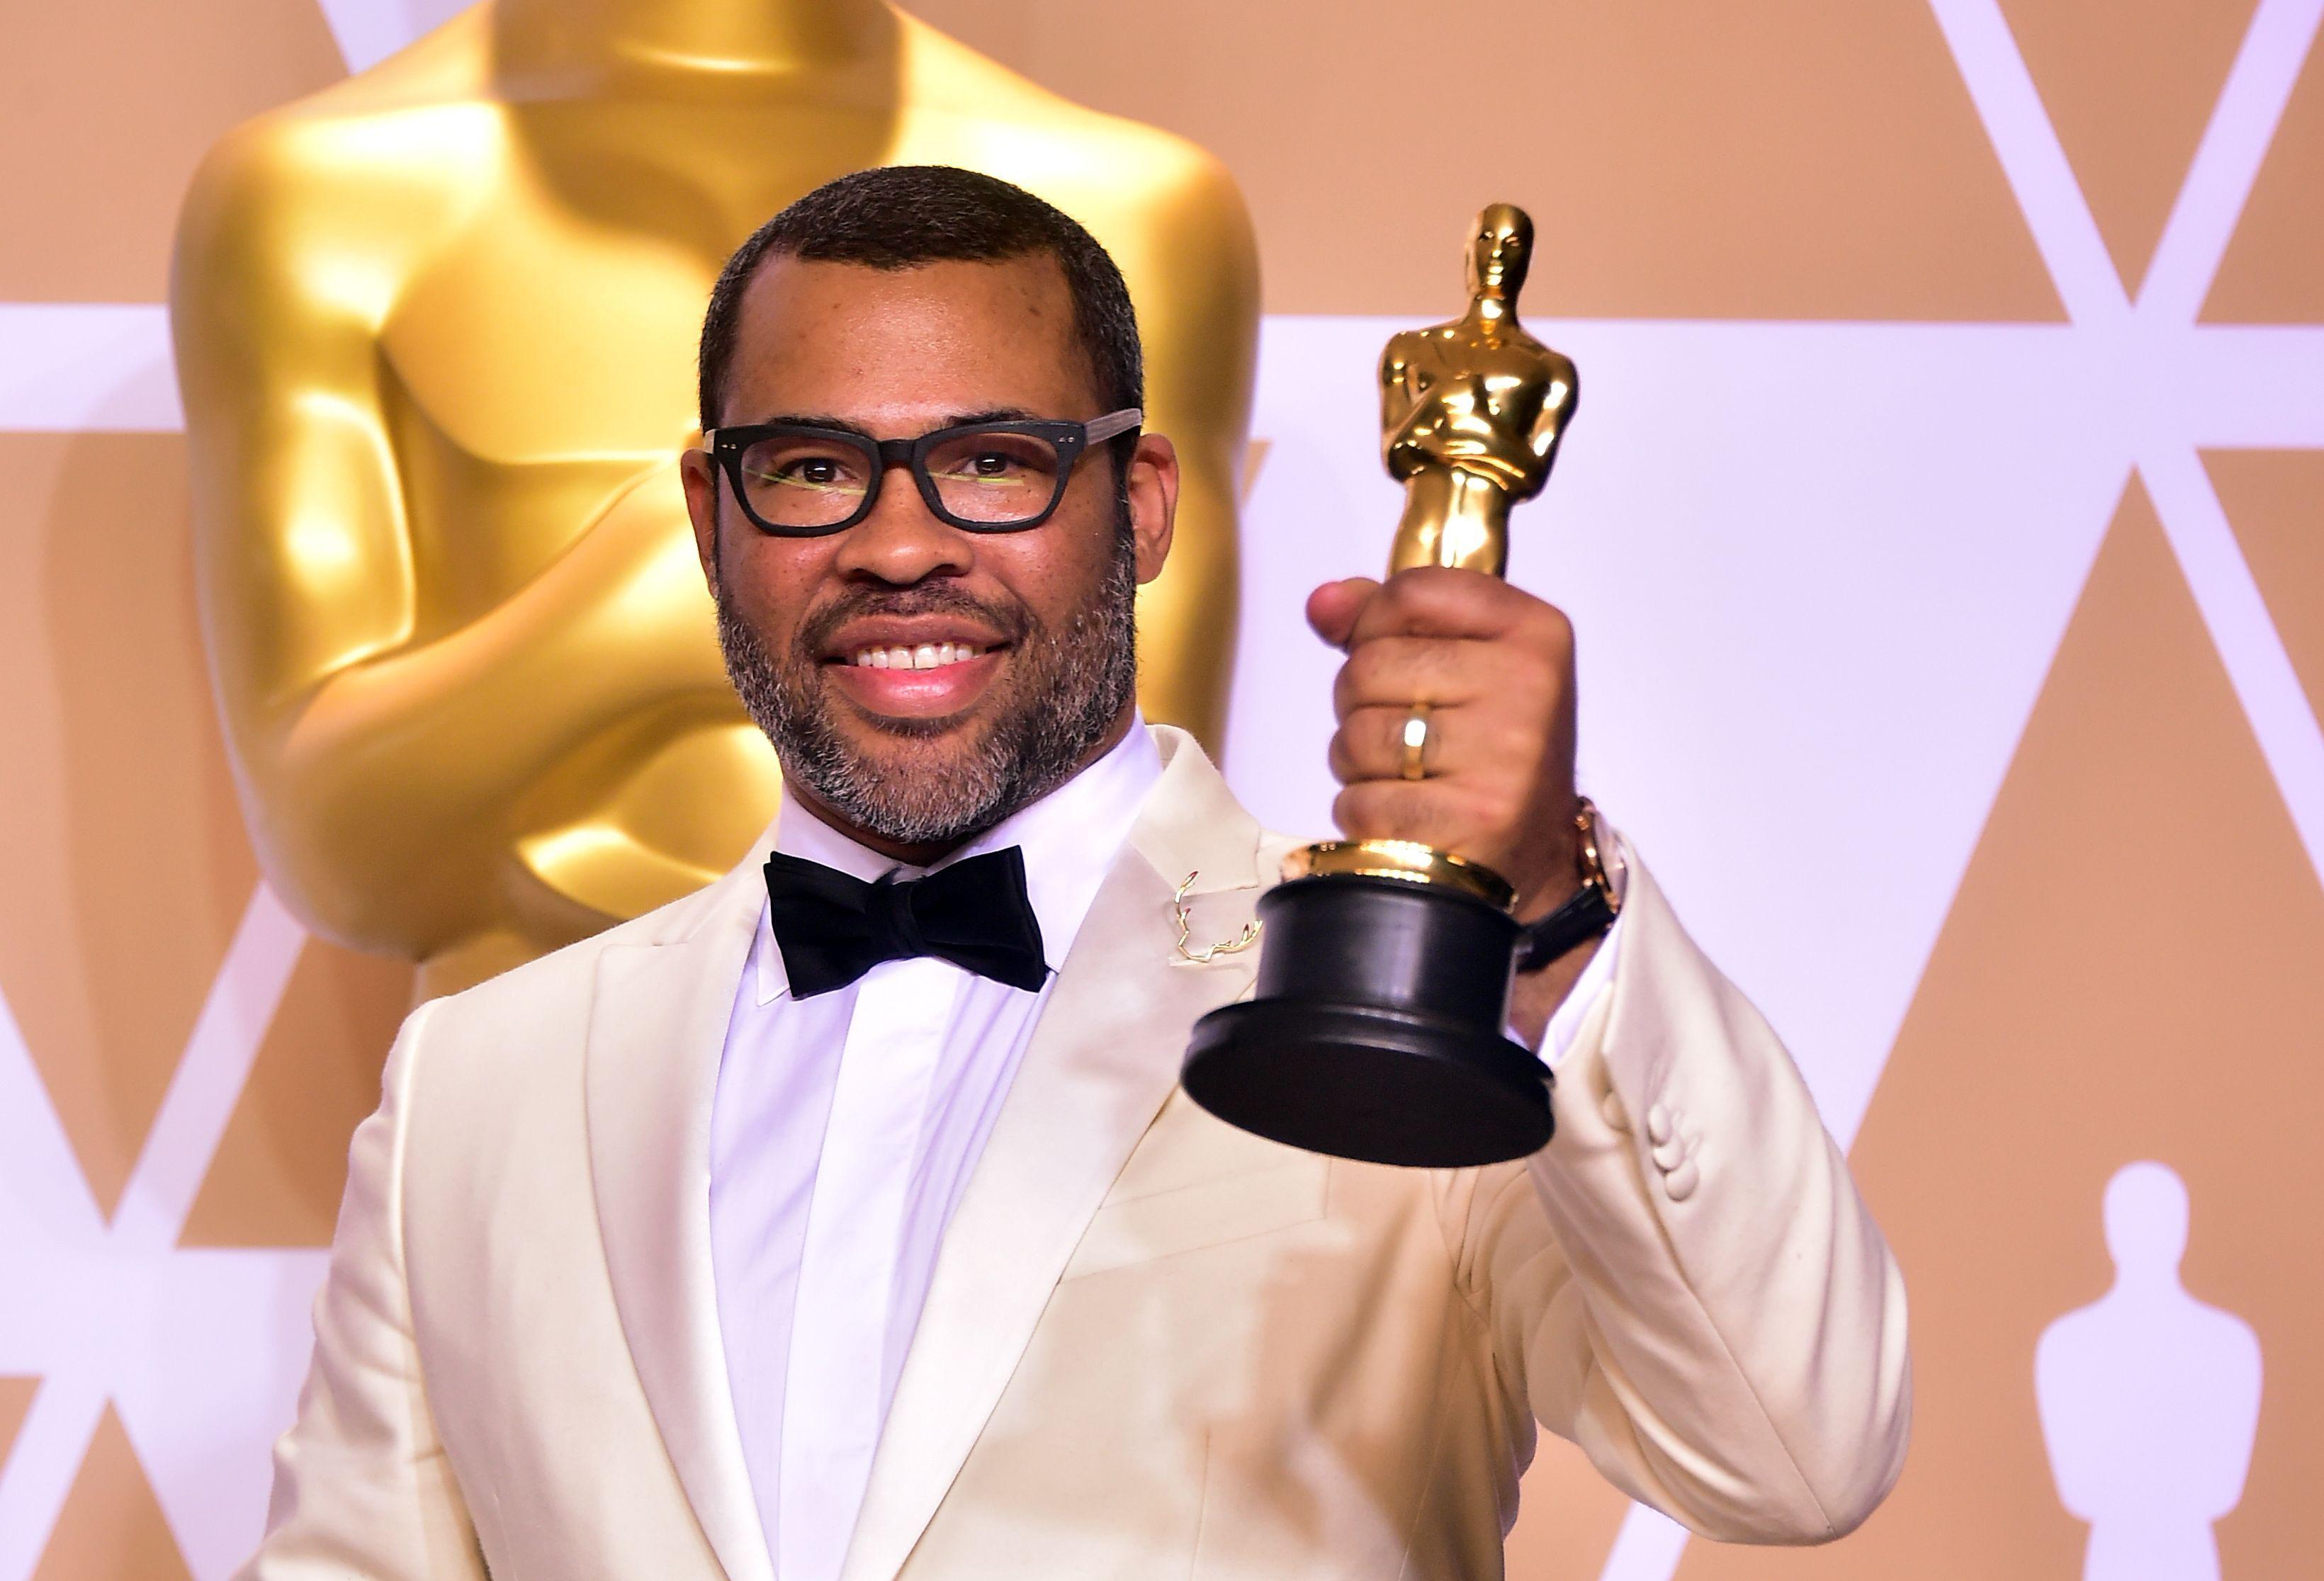 Jordan Peele poses with his Best Original Screenplay Oscar.